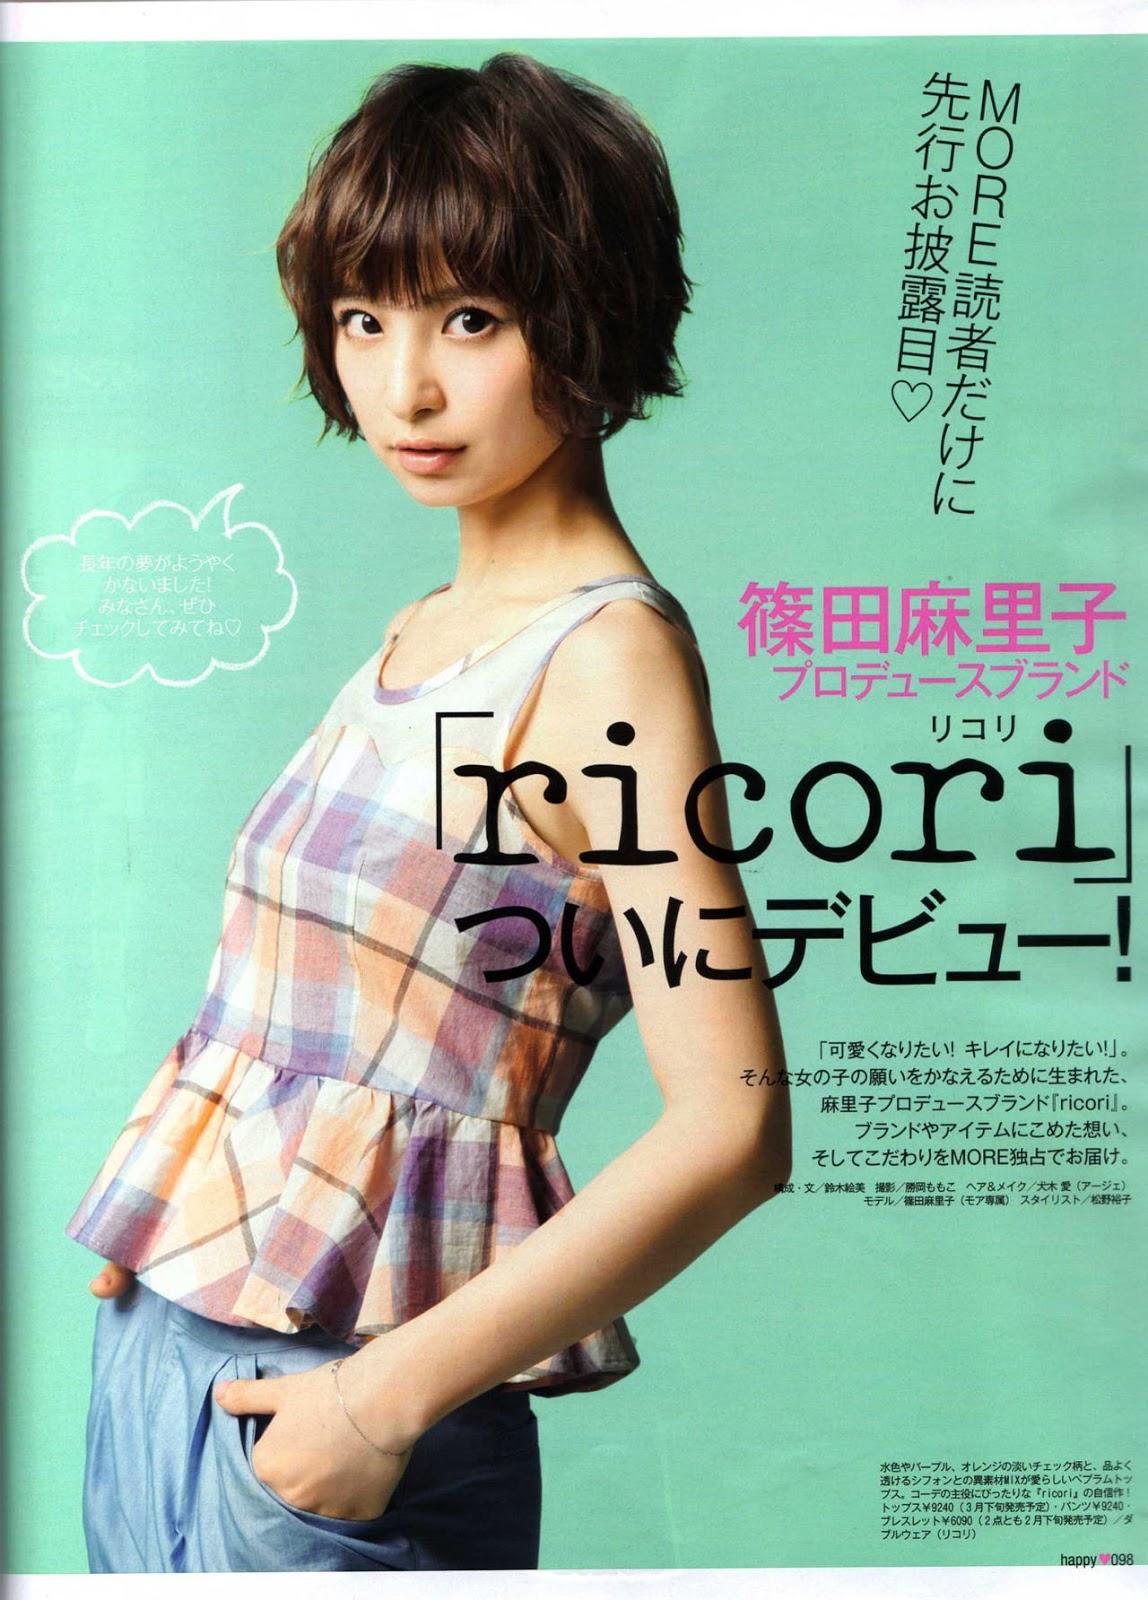 "More Magazine November 2014 Issue: AKB48 Mariko Shinoda ""ricori Debut"" On MORE Magazine"